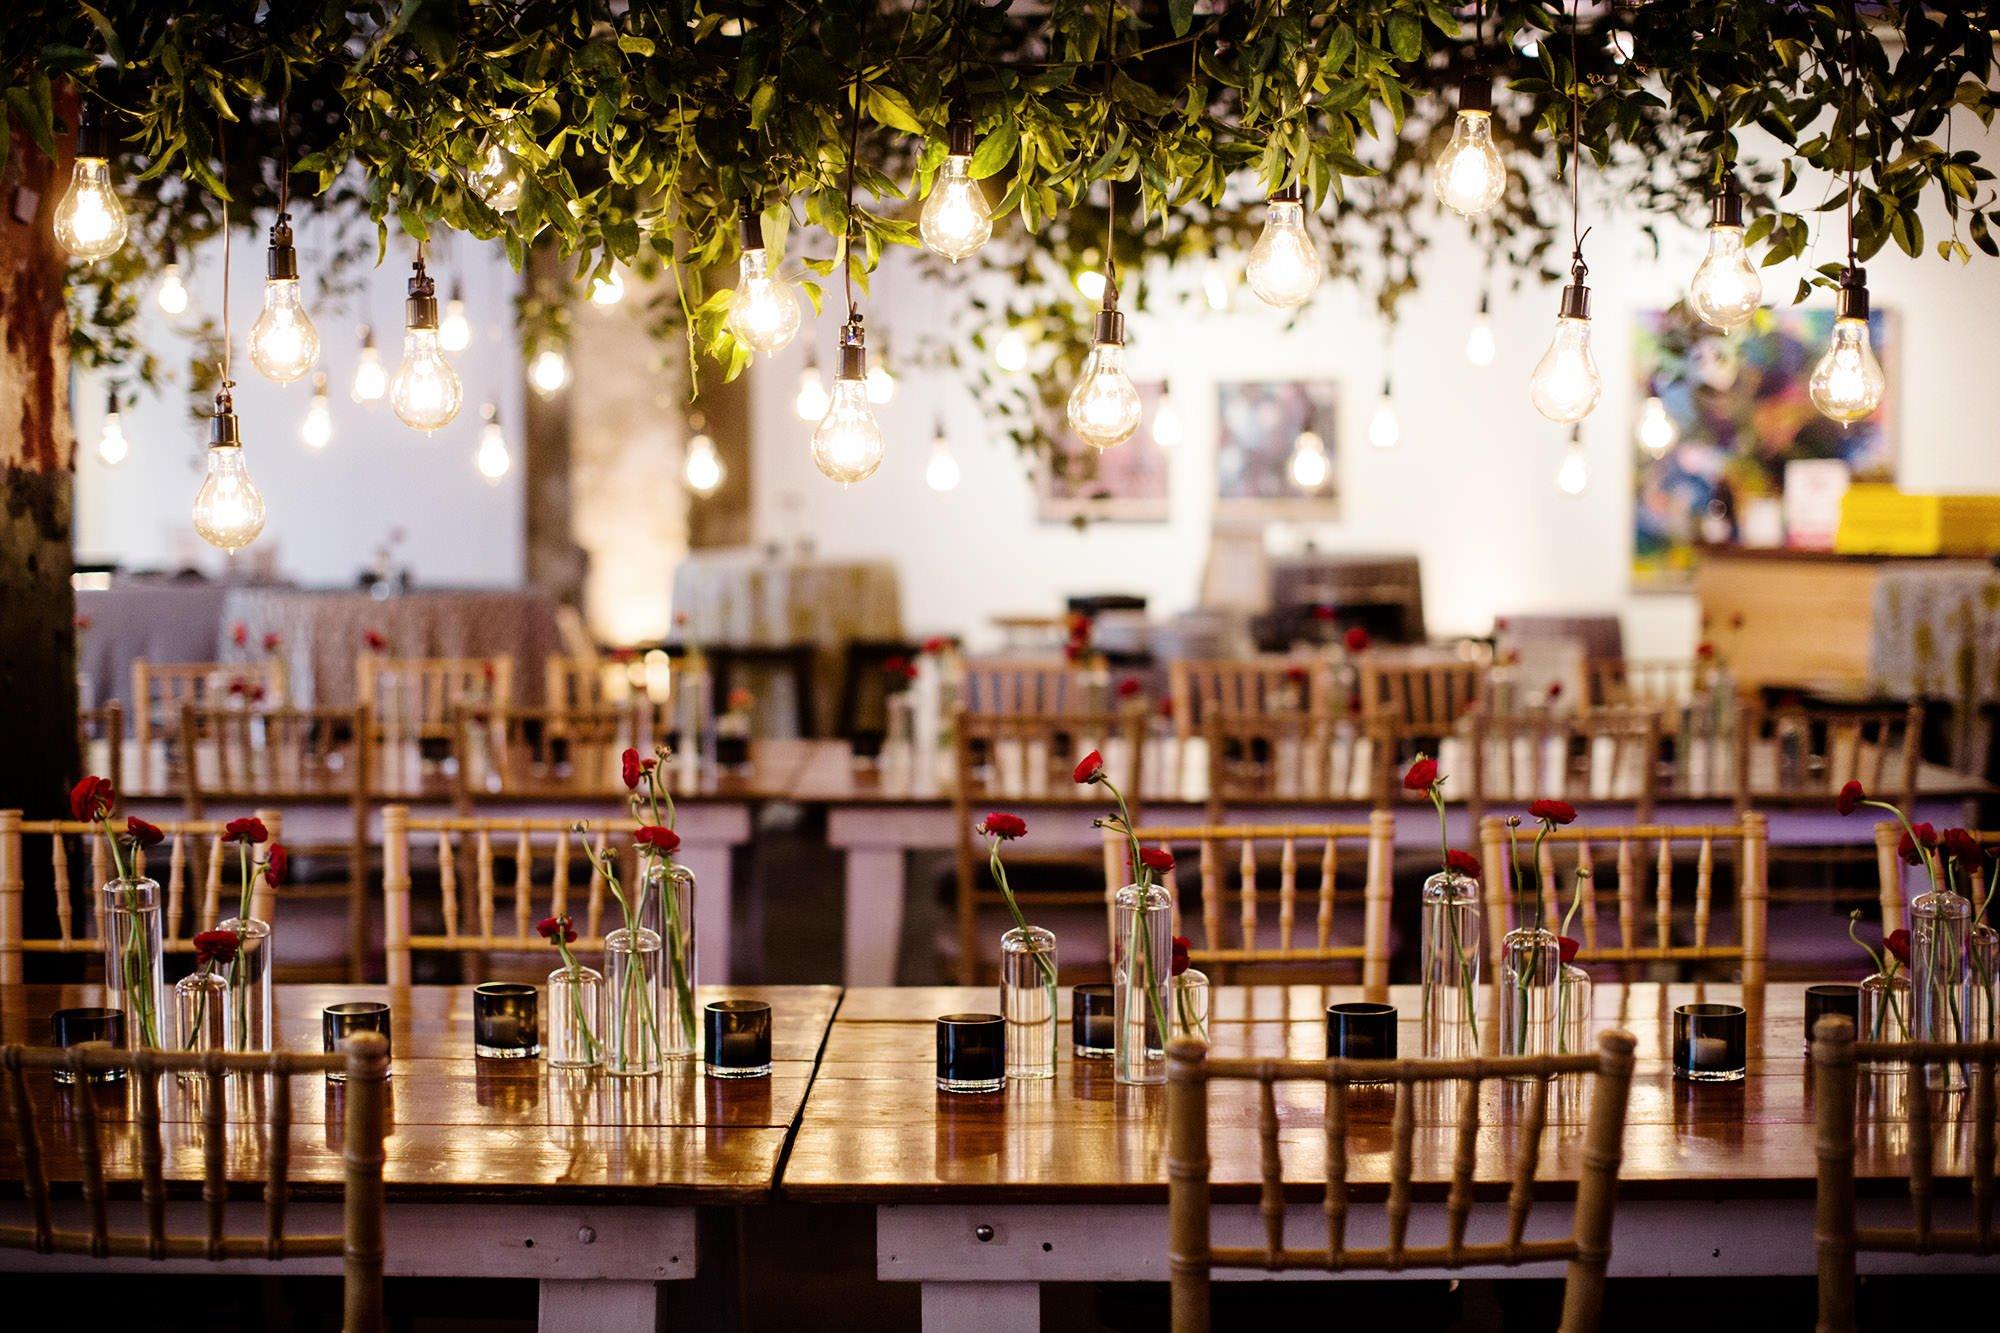 Longview Gallery Wedding in Washington, DC  I  Reception Space